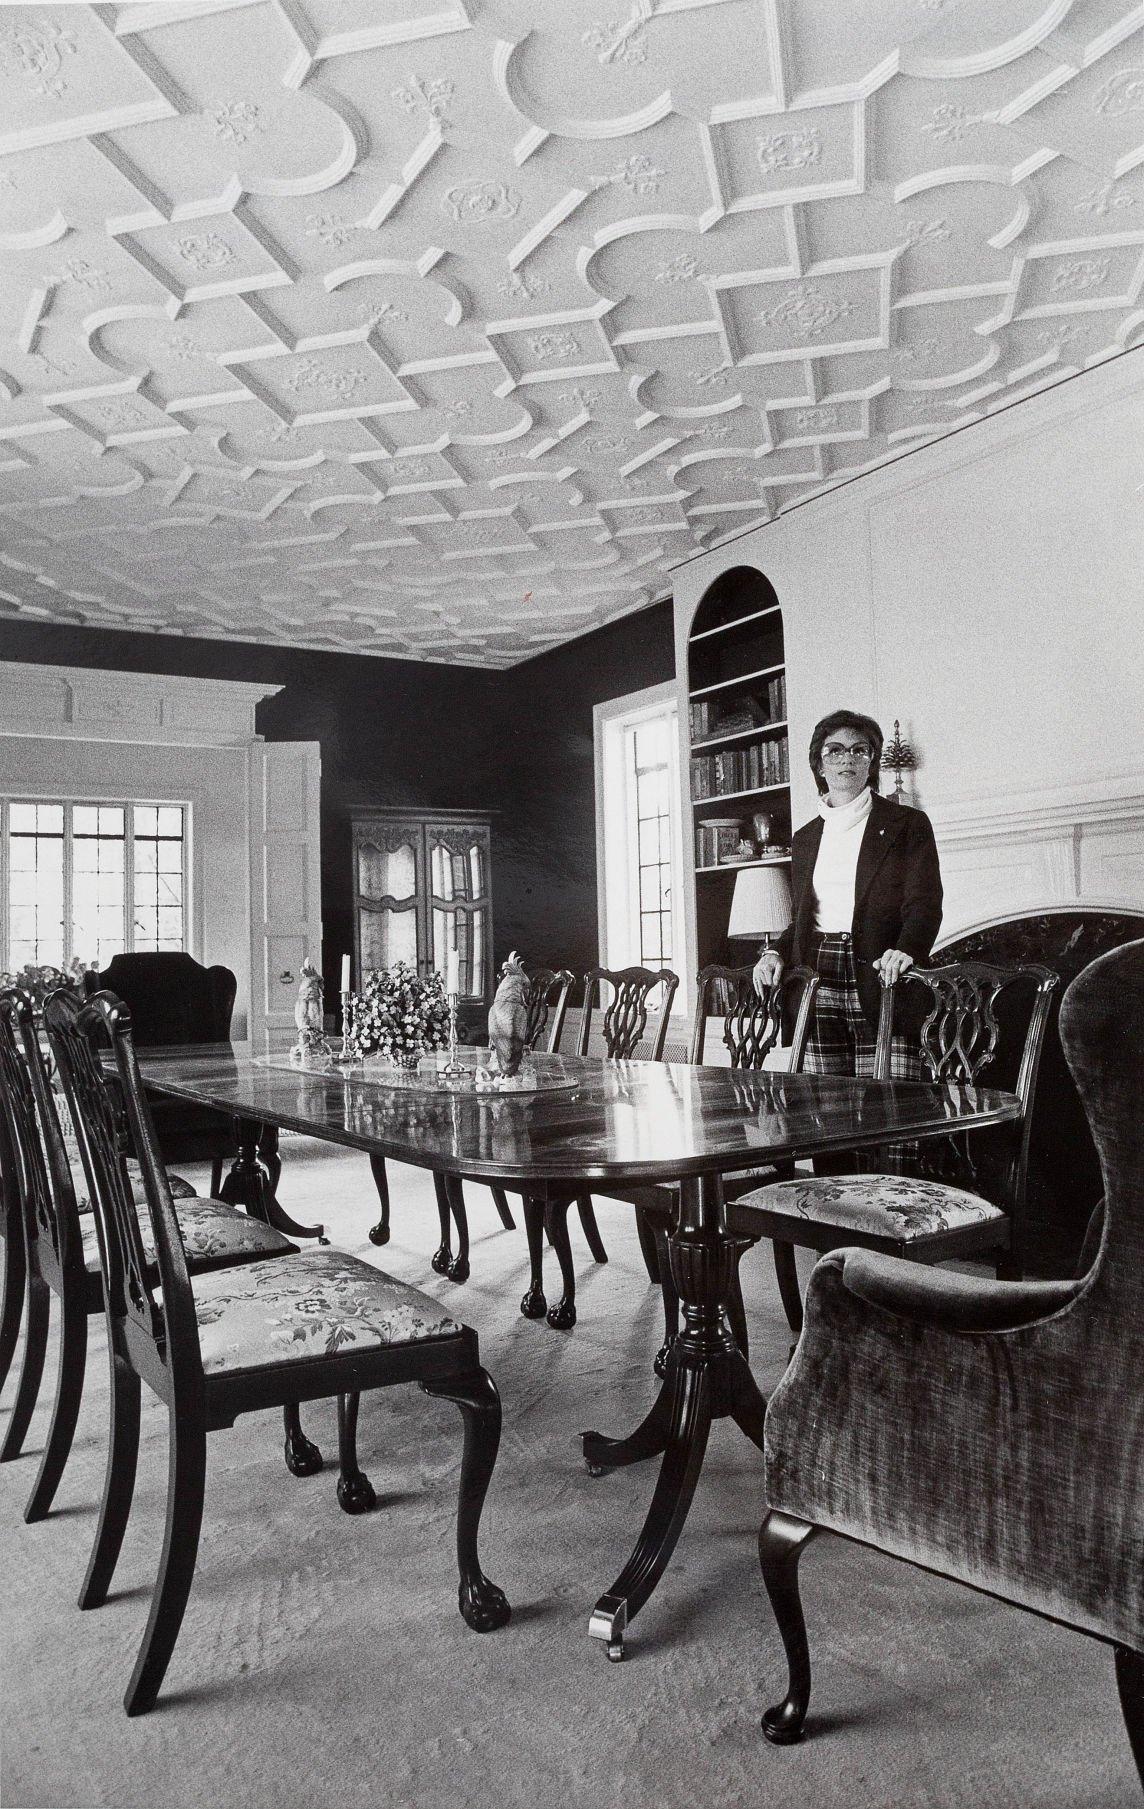 A Peek Inside Greensboros Historic Julian Price Home Galleries